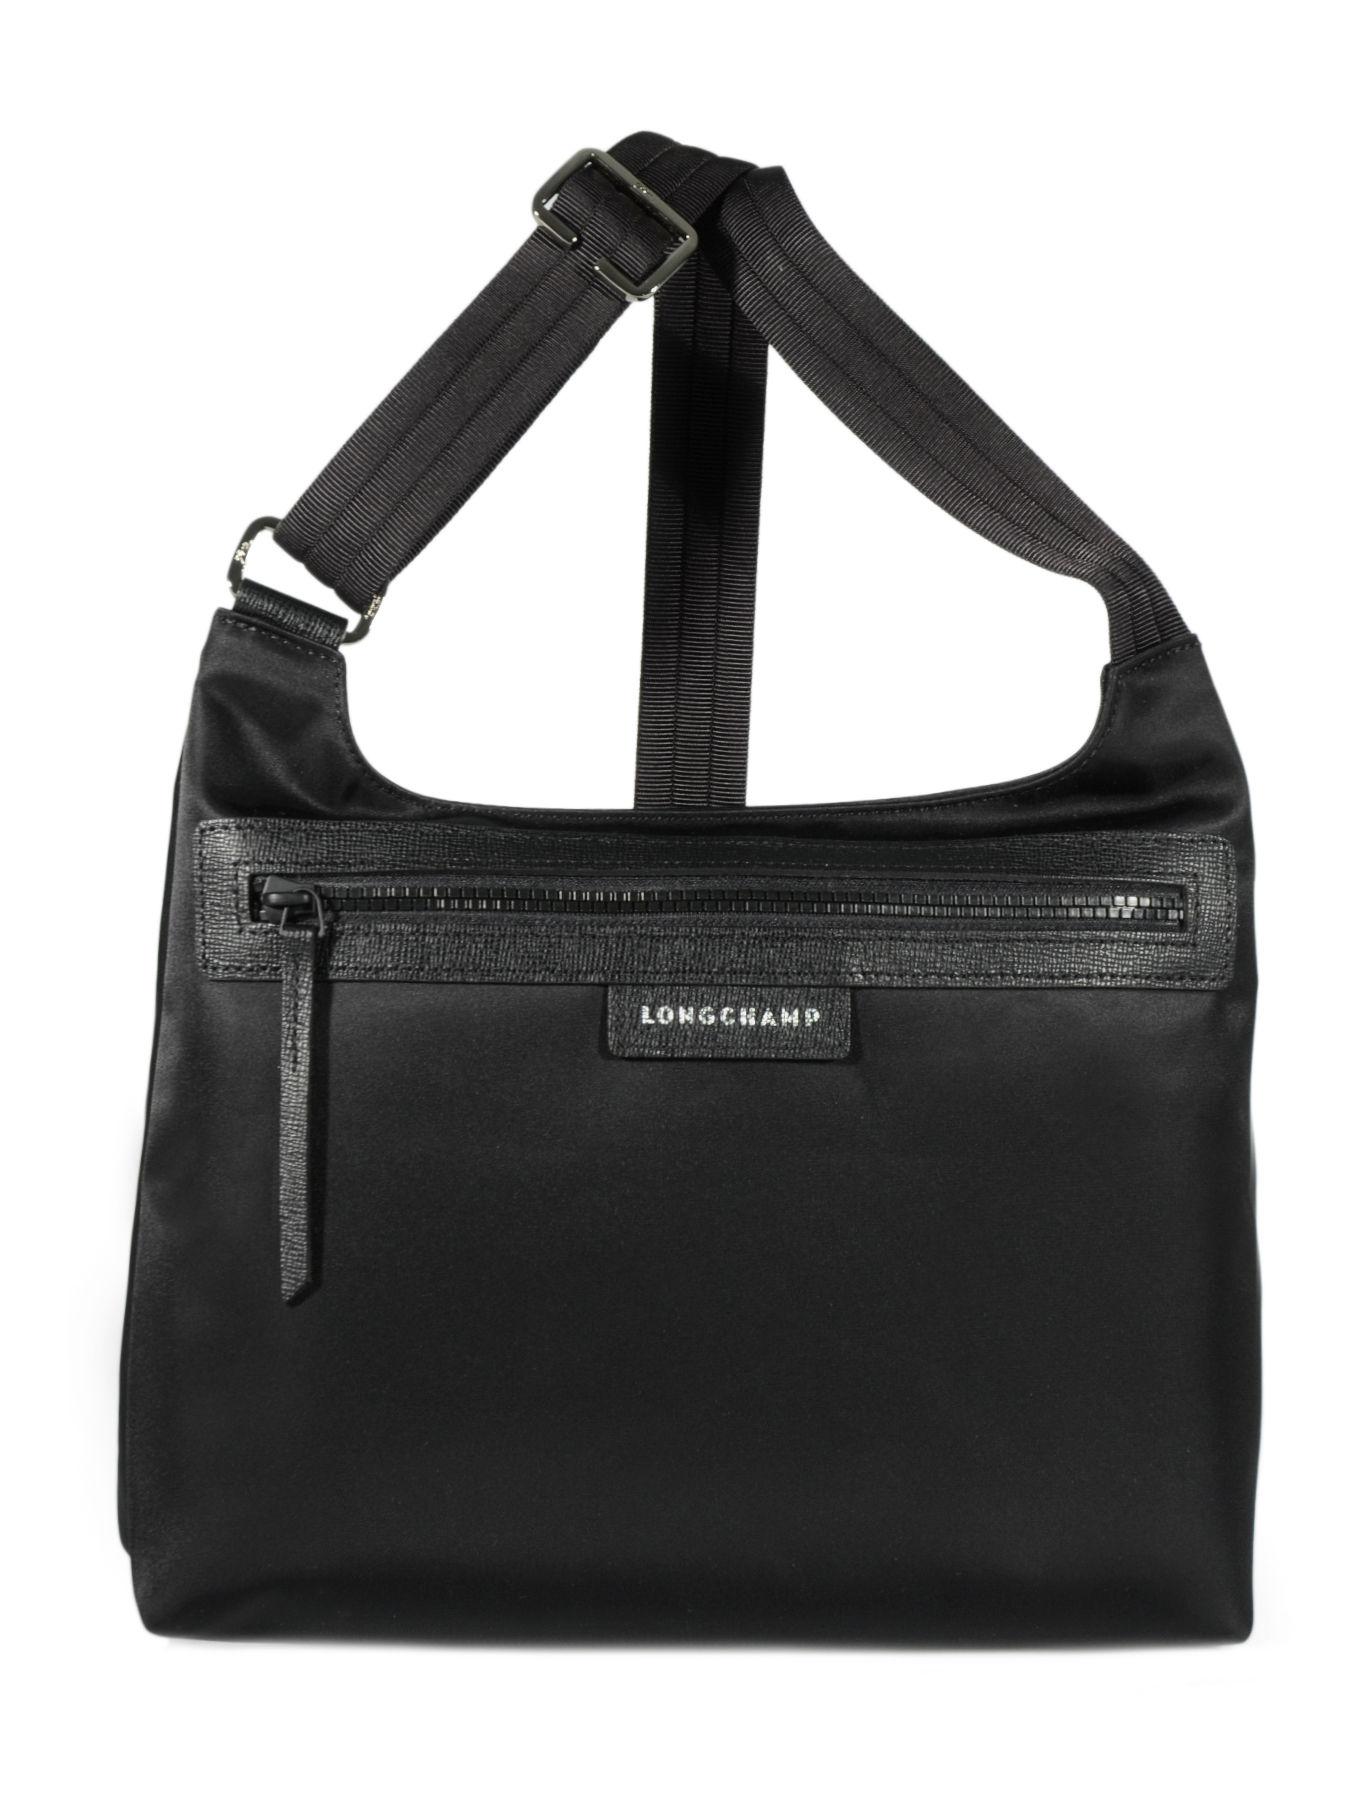 Longchamp Messenger bag Black · Longchamp Messenger bag Black ... 3bfadce85a